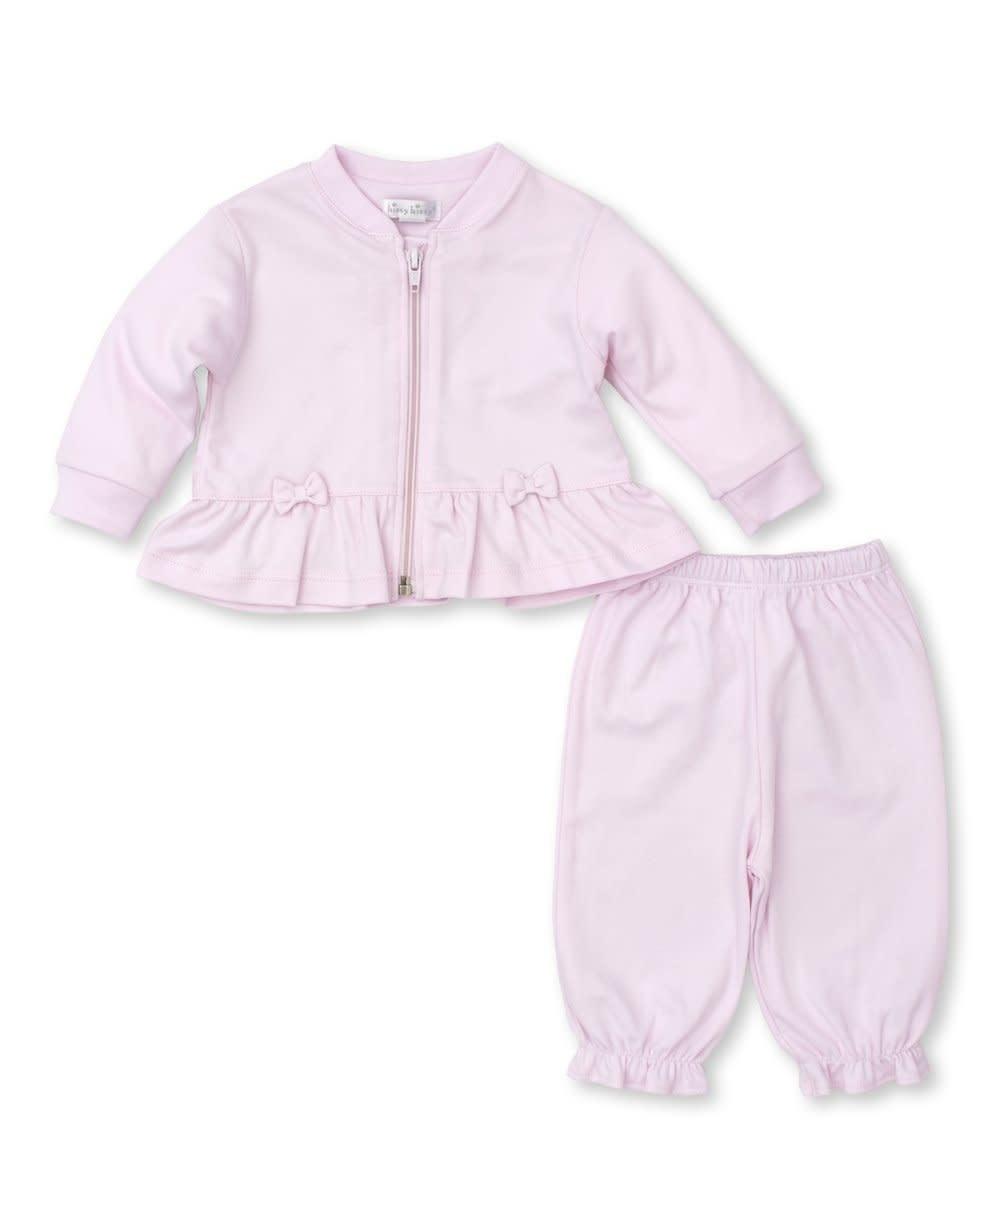 Kissy Kissy Pink Bow Pant Suit